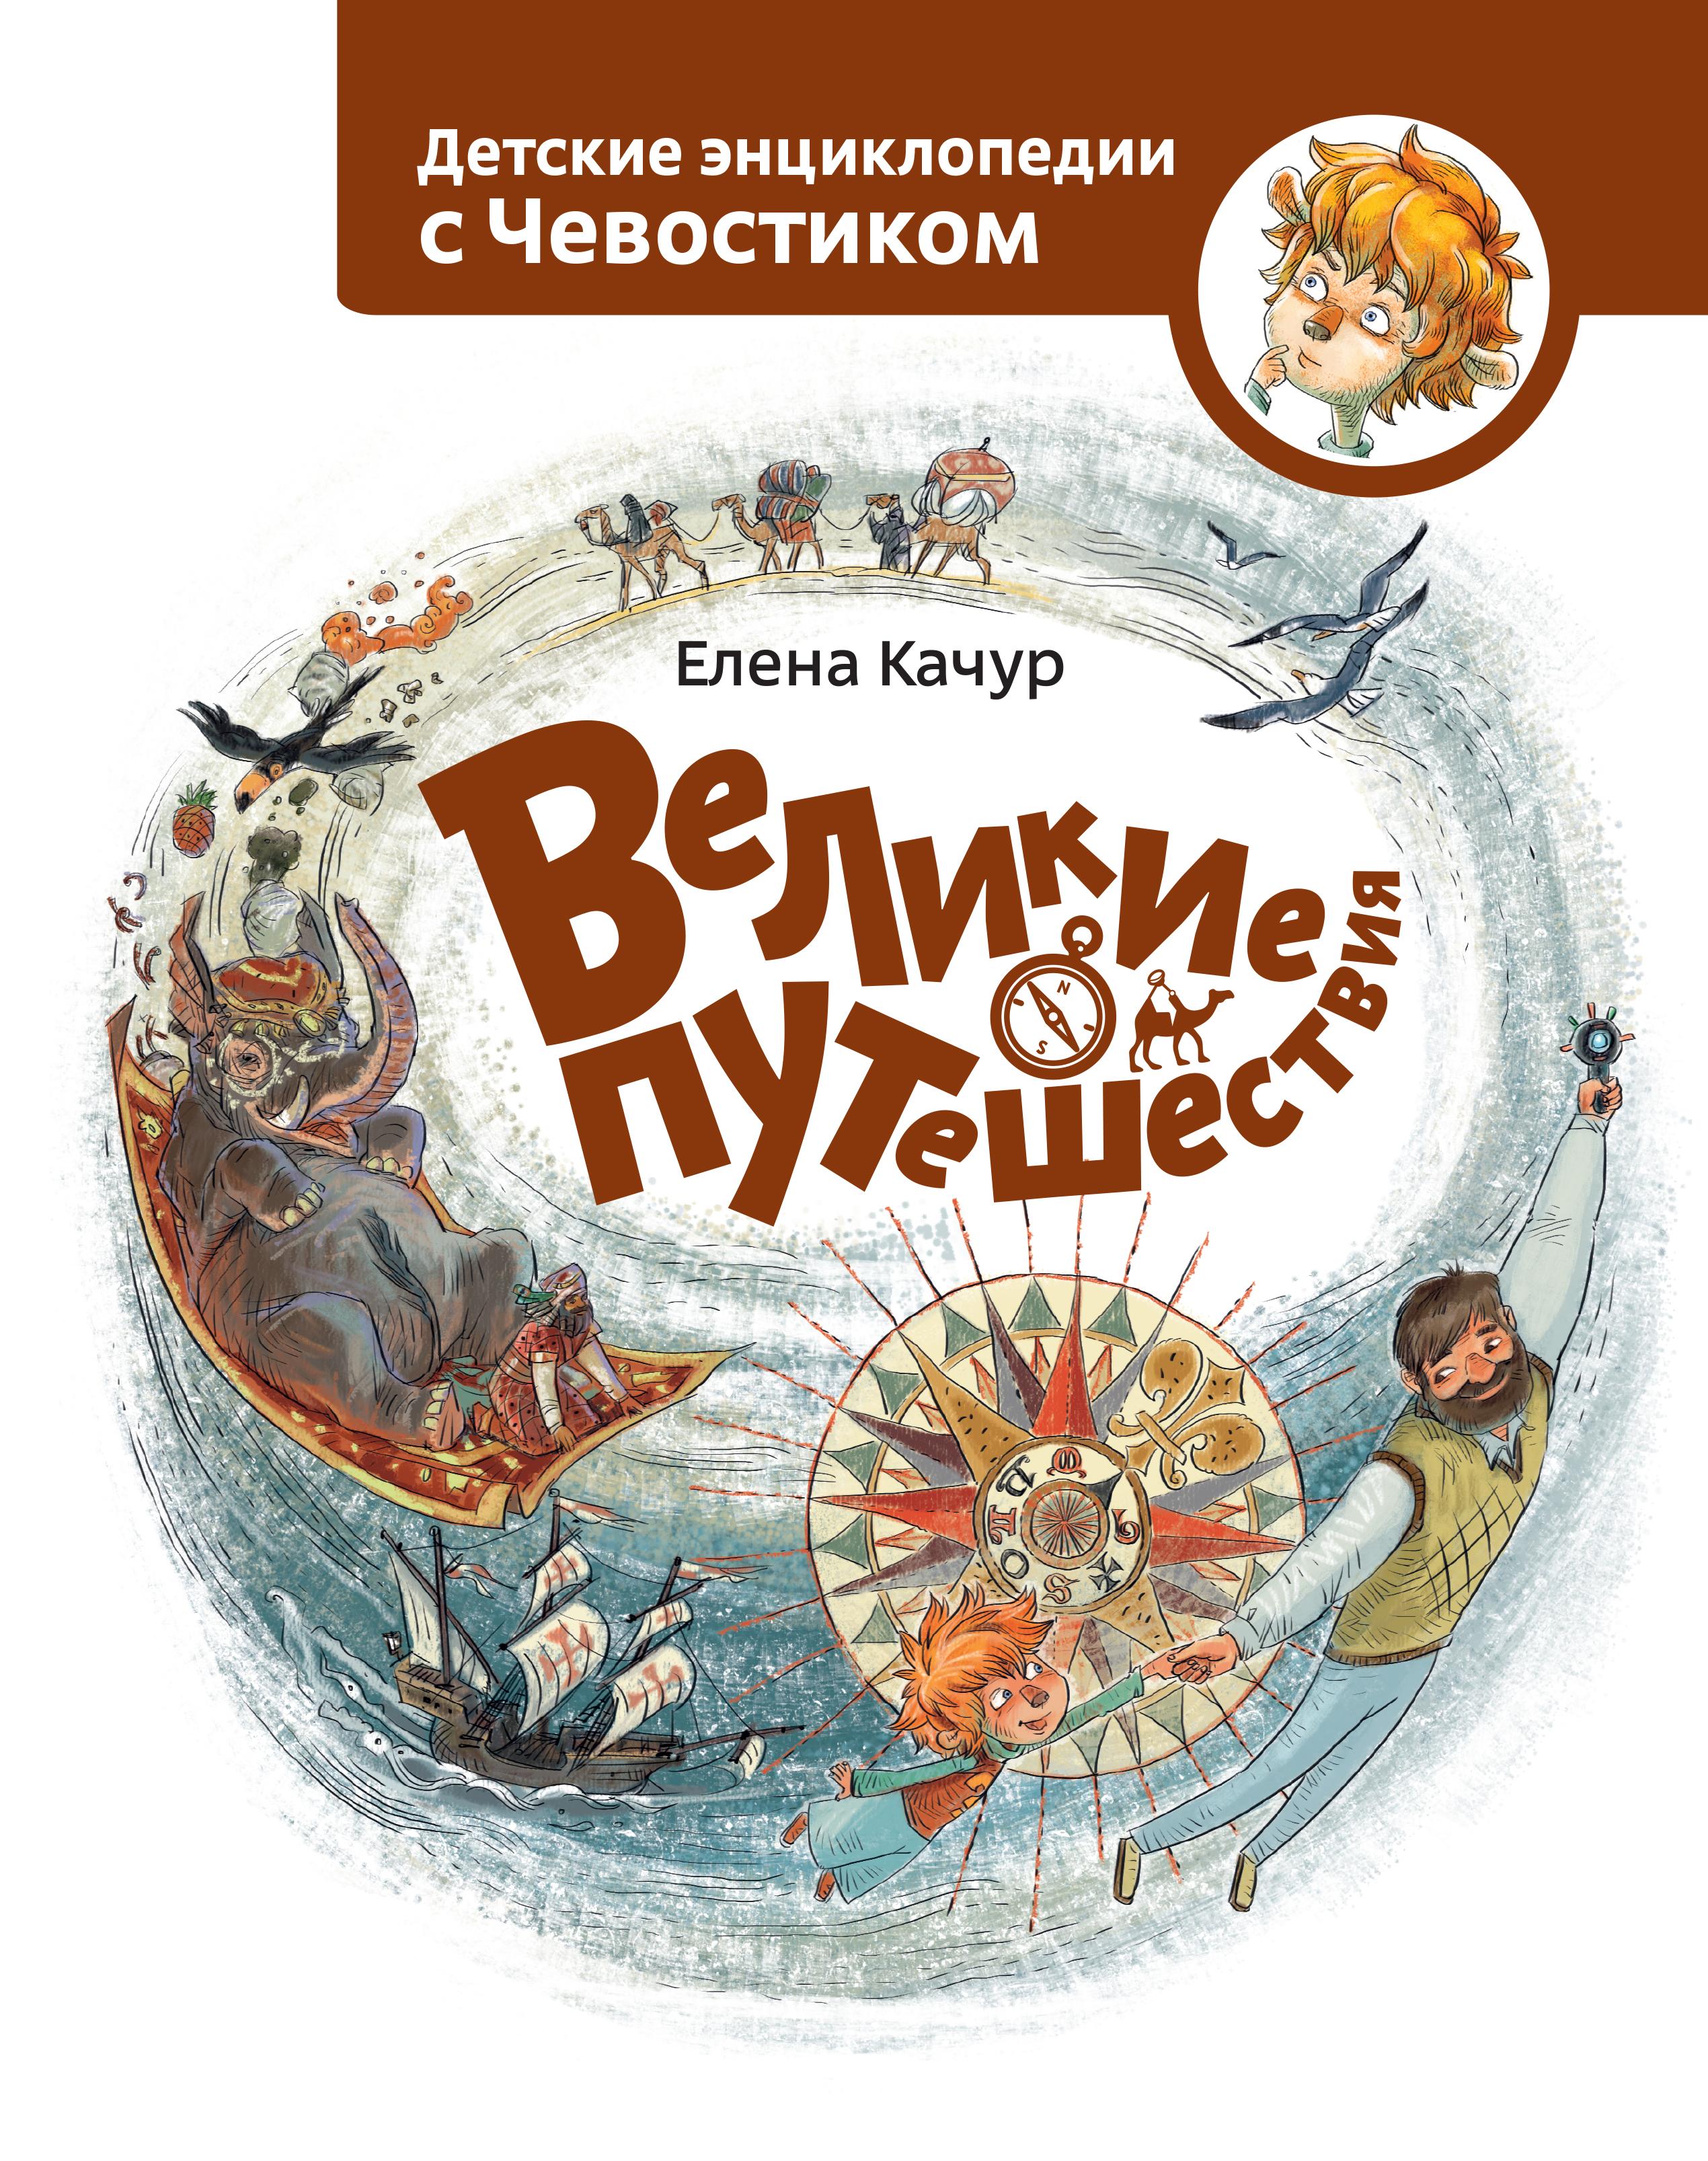 Книга Великие путешествия. Елена Качур